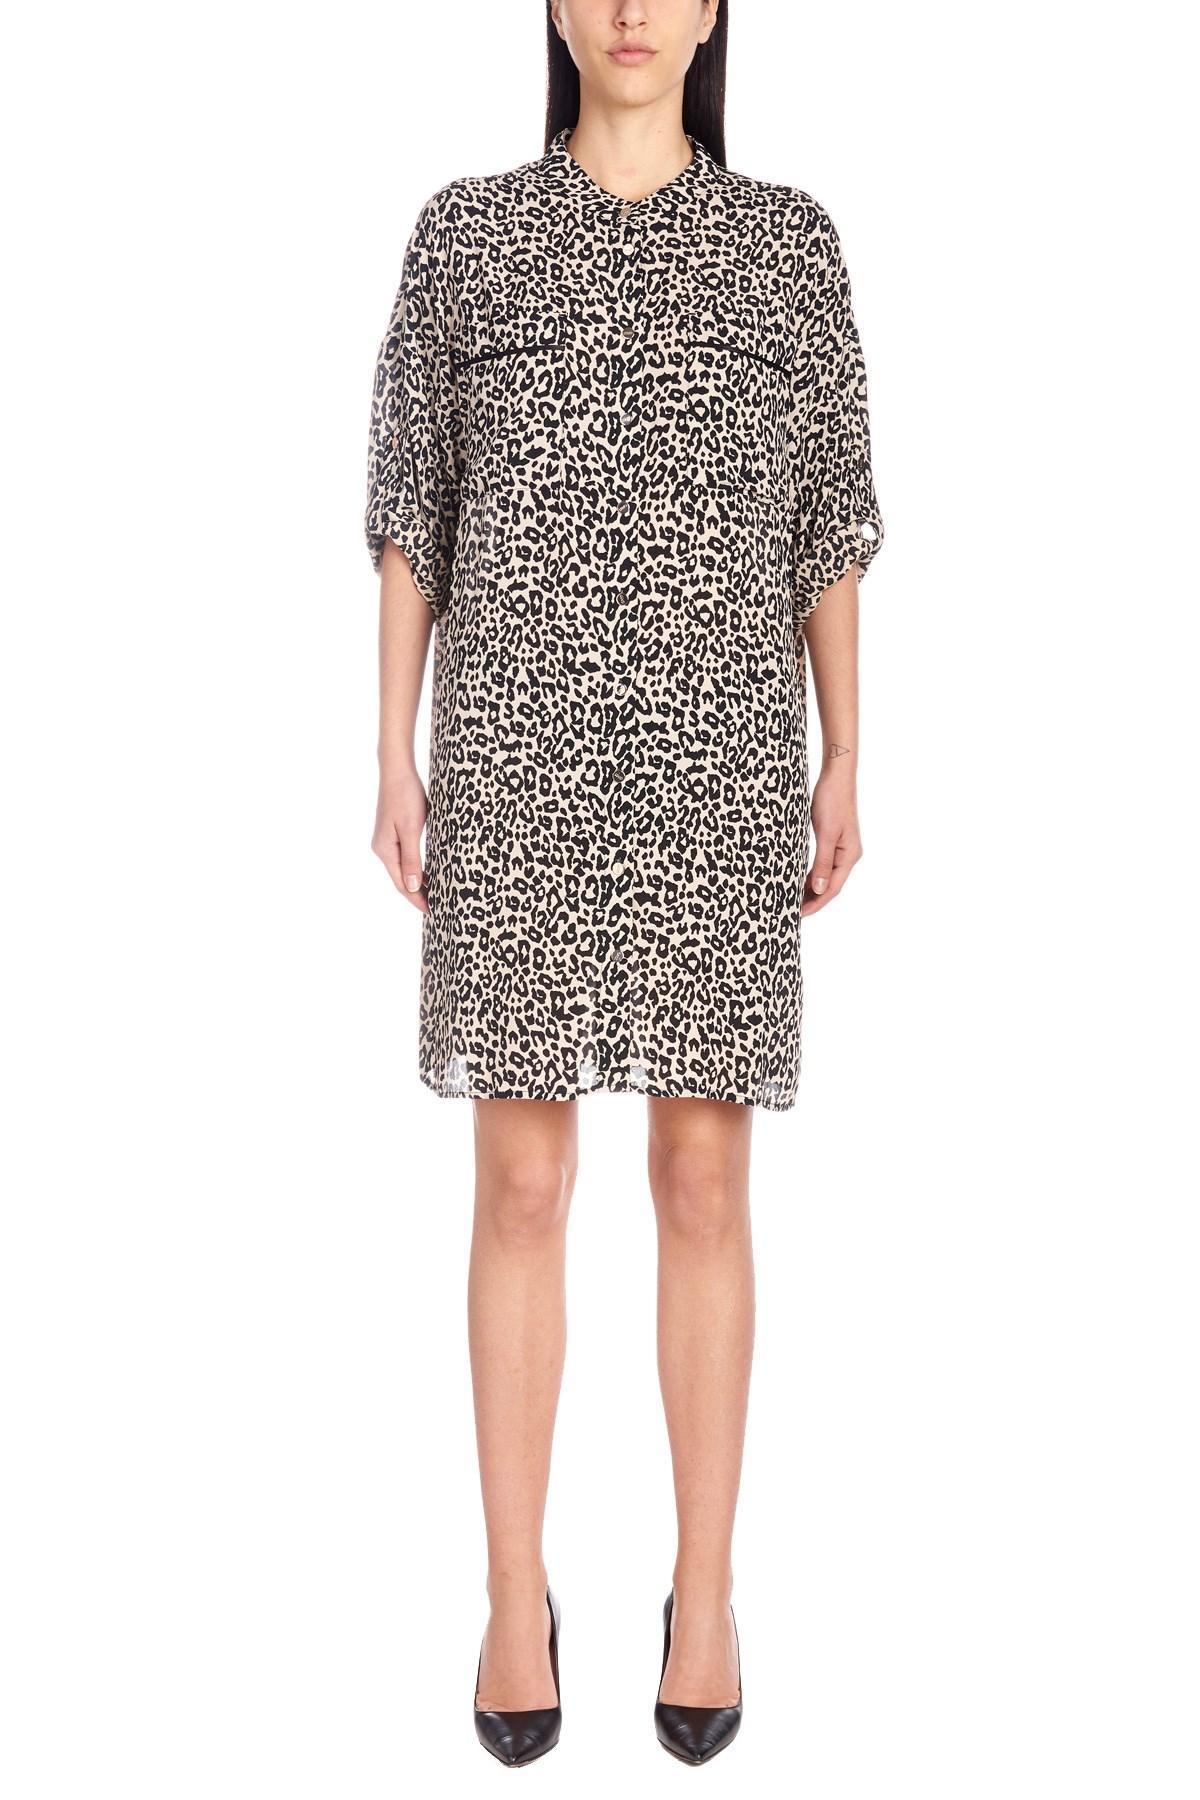 28686ebf23 Liu Jo - Multicolor Animalier Dress - Lyst. View fullscreen